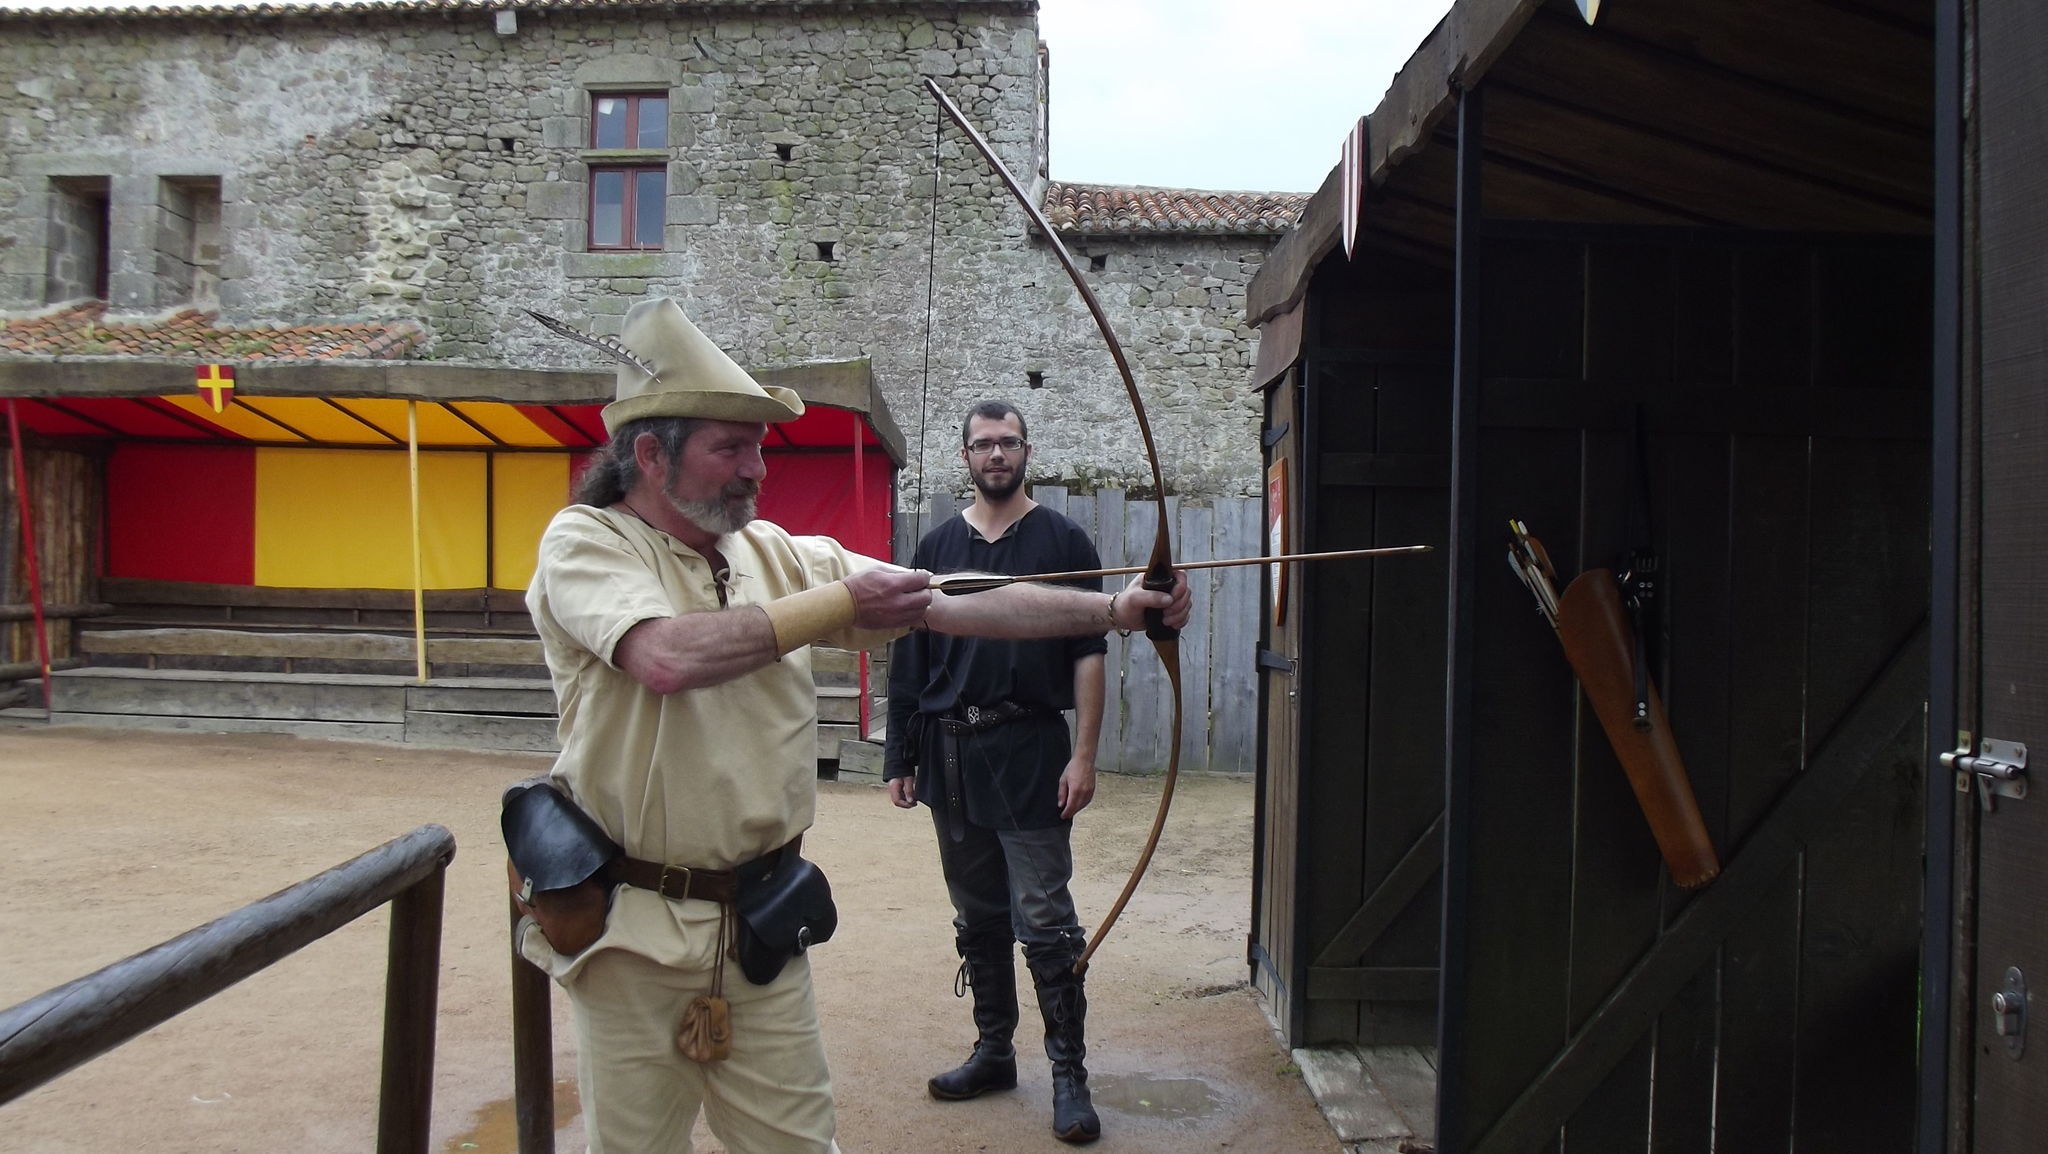 Vendée et PDF juin 2013 (1) 050